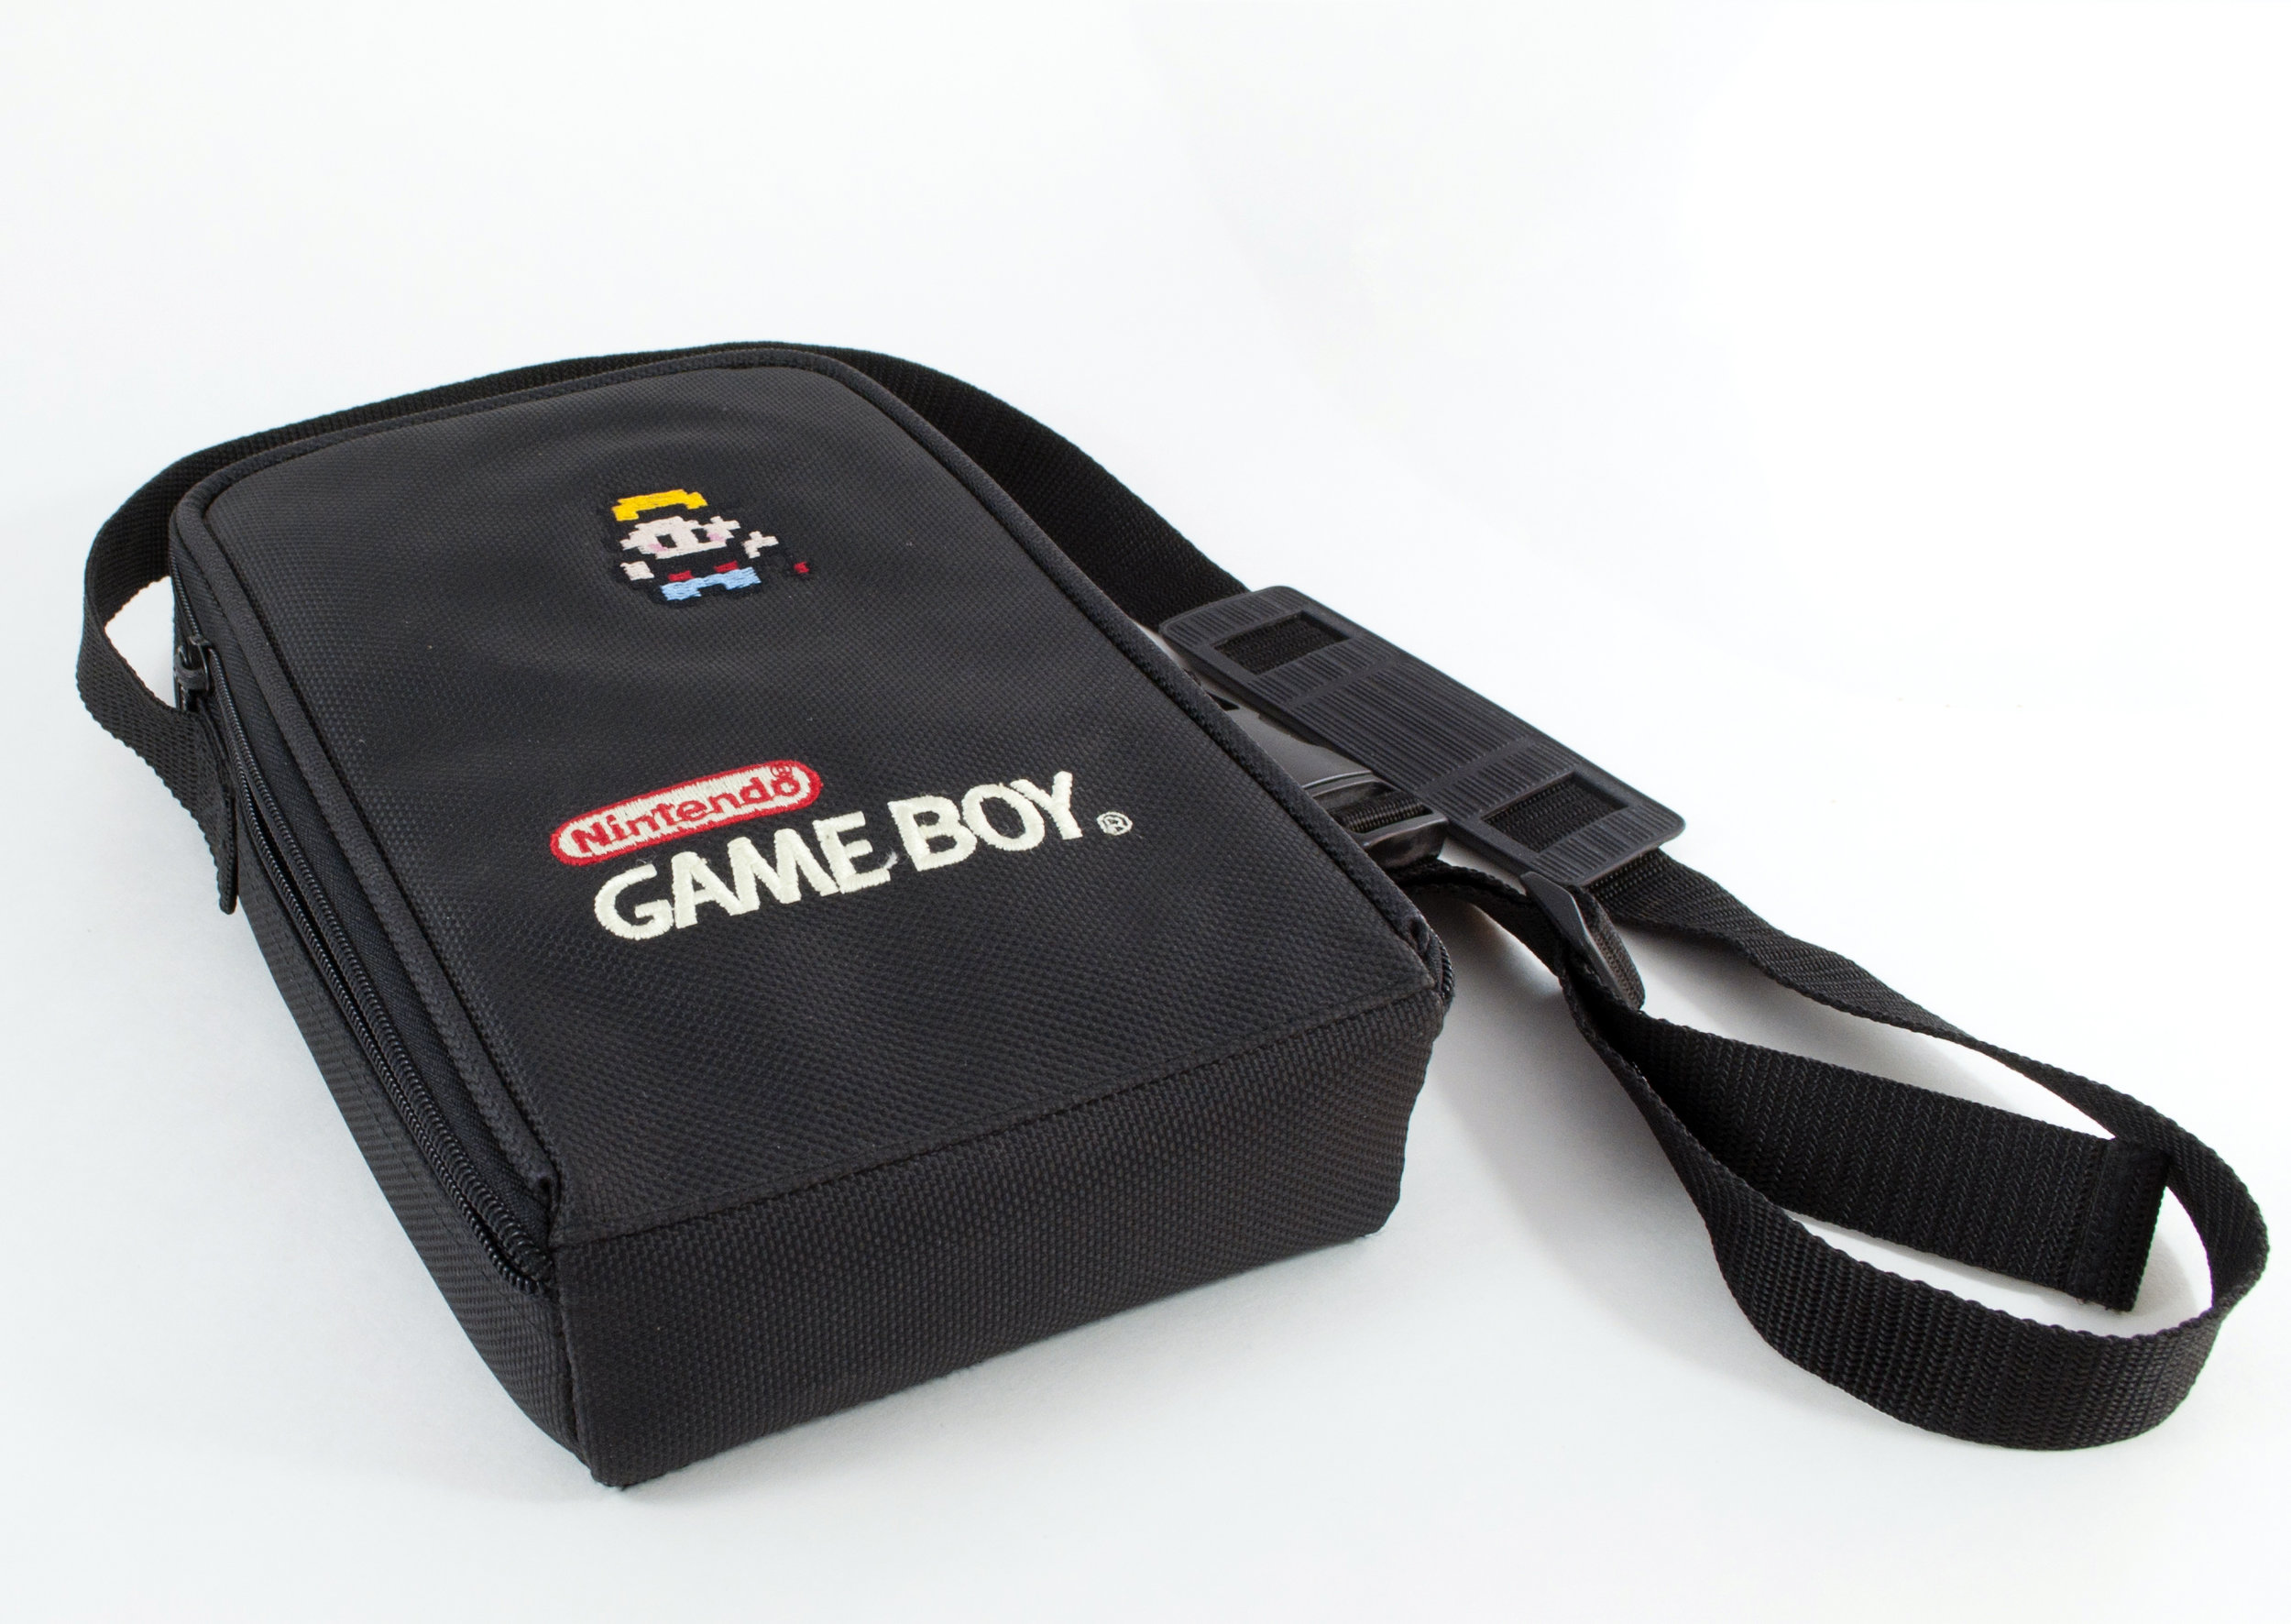 _1Gameboy bag closed.jpg